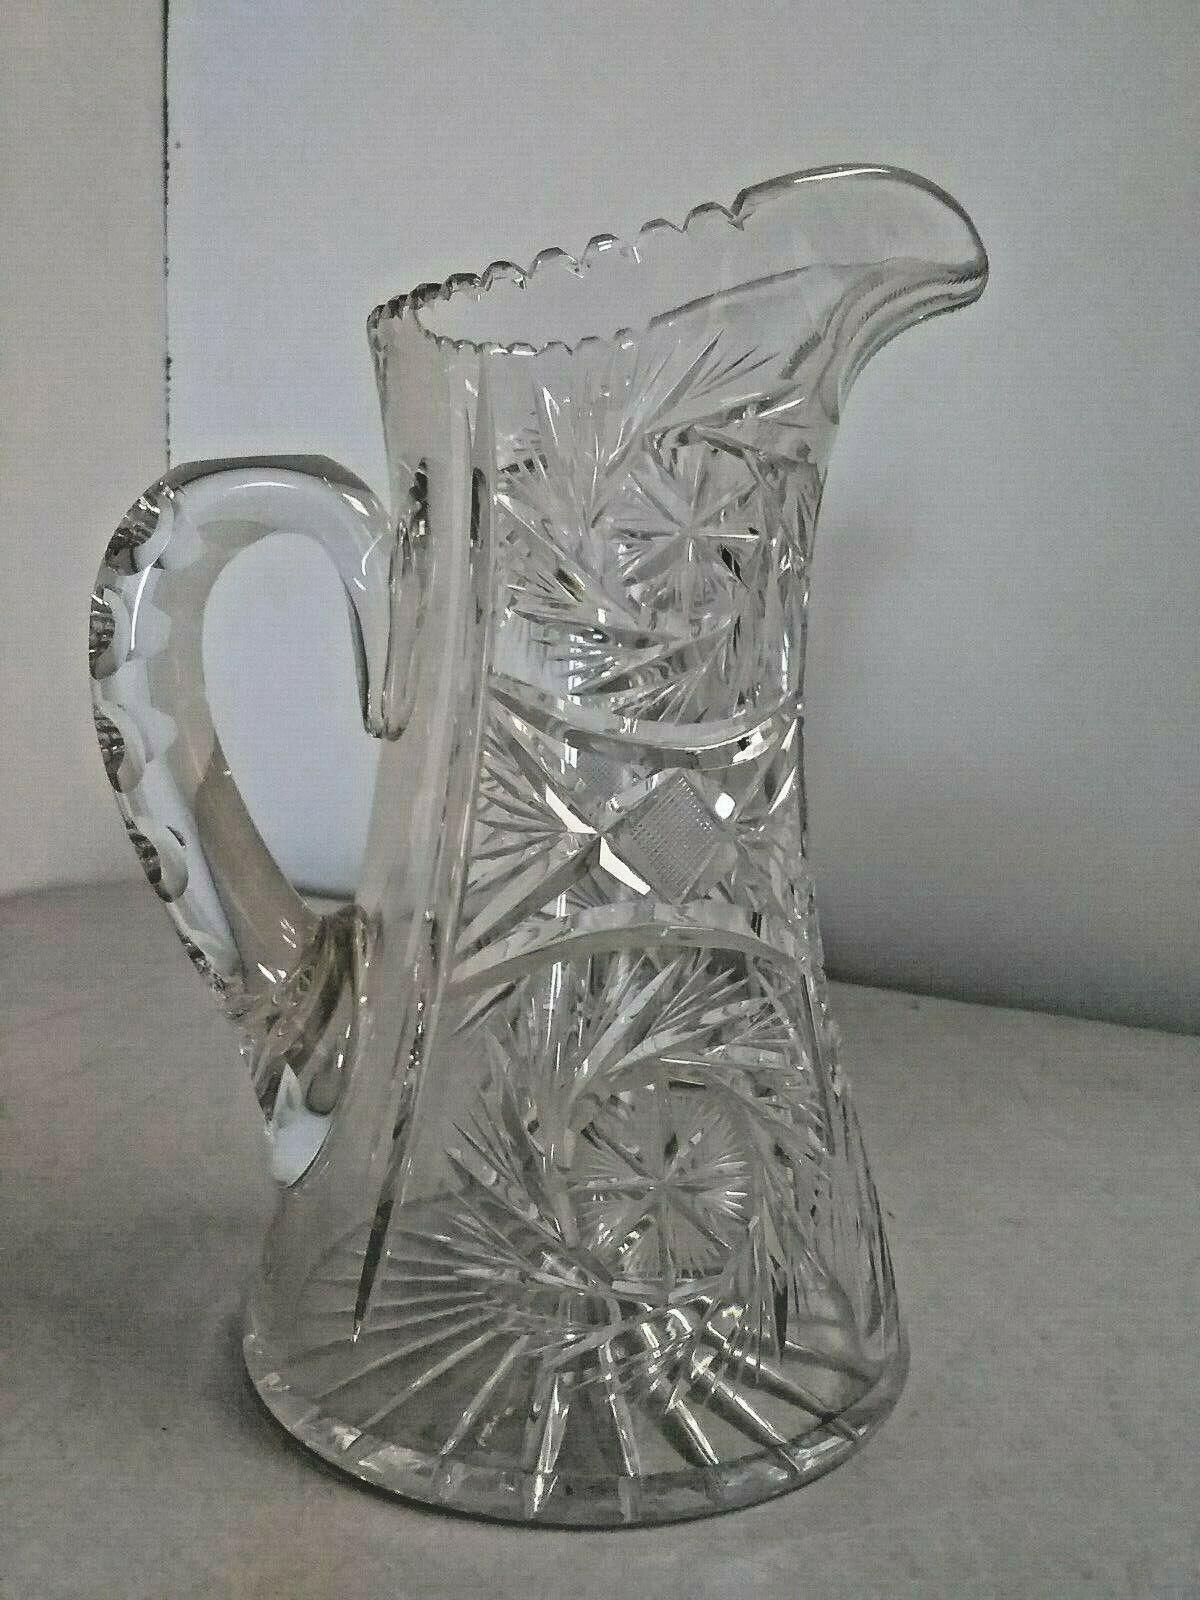 Vintage Art Deco Raised 5 Ring Clear Glass Pitcher 8\u201d Tall 5.5\u201d Across